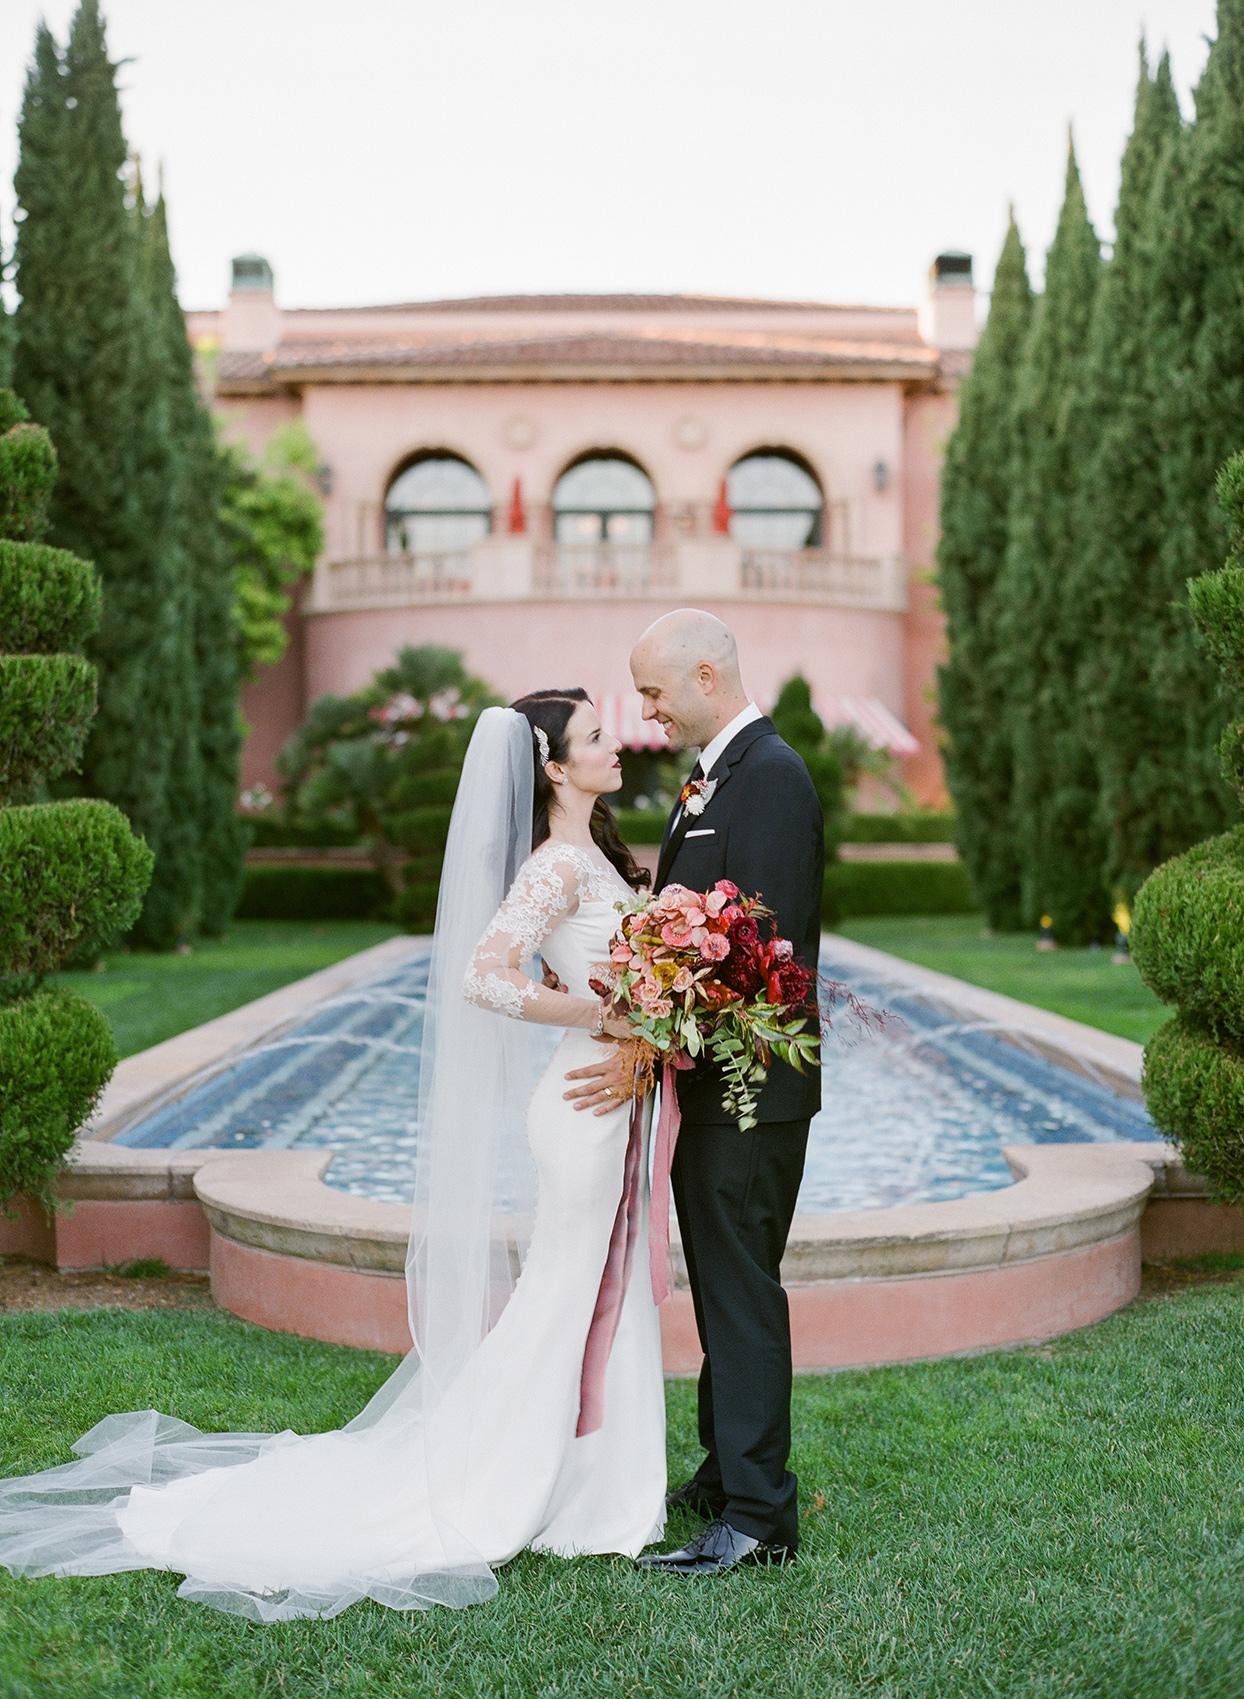 bride and groom in elegant wedding attire portrait at hotel